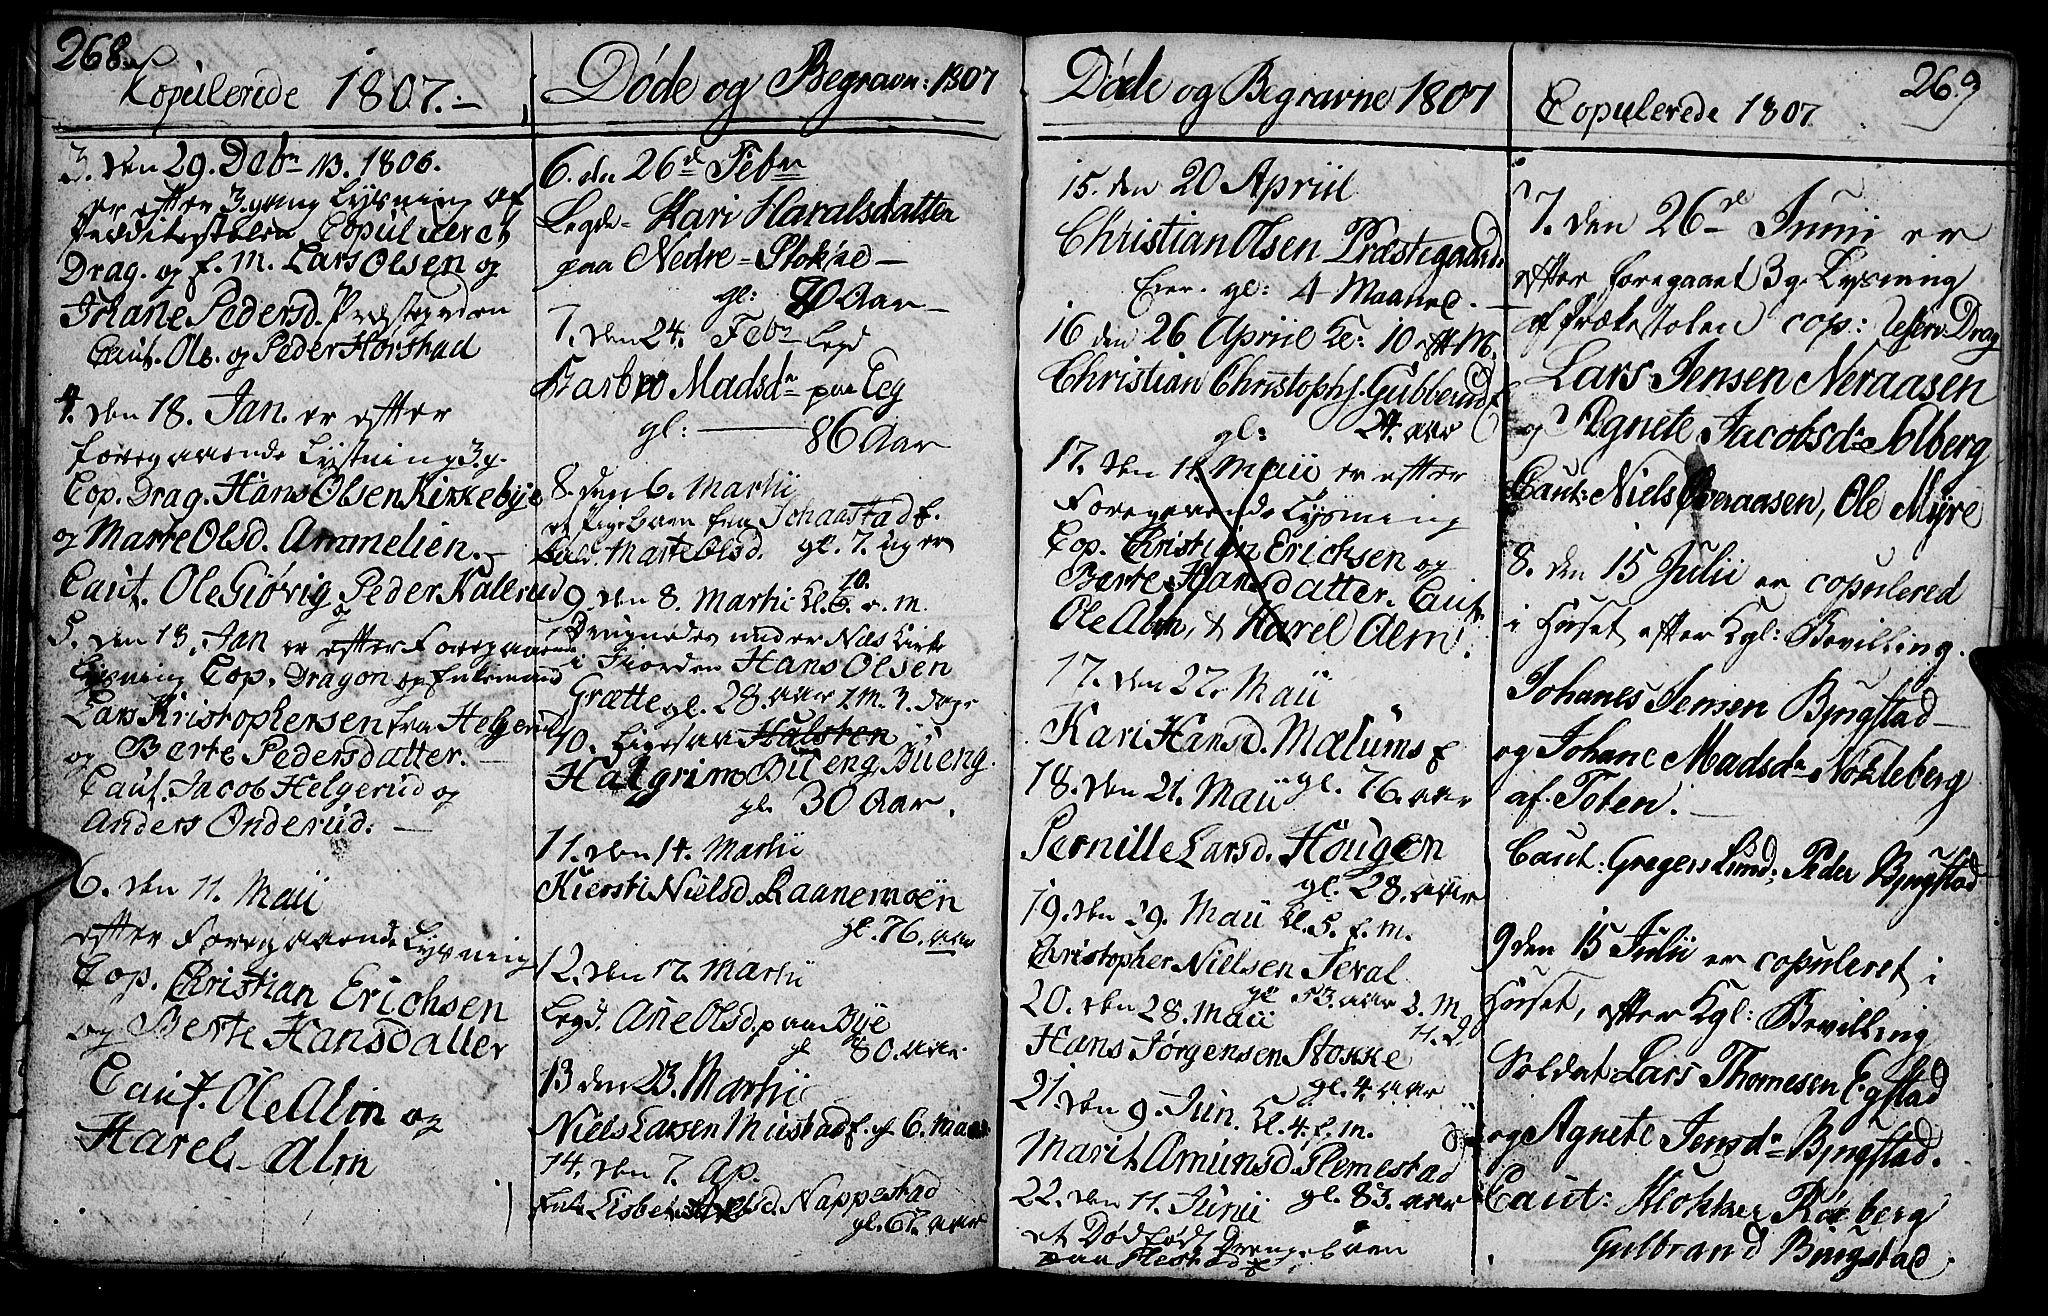 SAH, Vardal prestekontor, H/Ha/Hab/L0003: Klokkerbok nr. 3, 1803-1808, s. 268-269